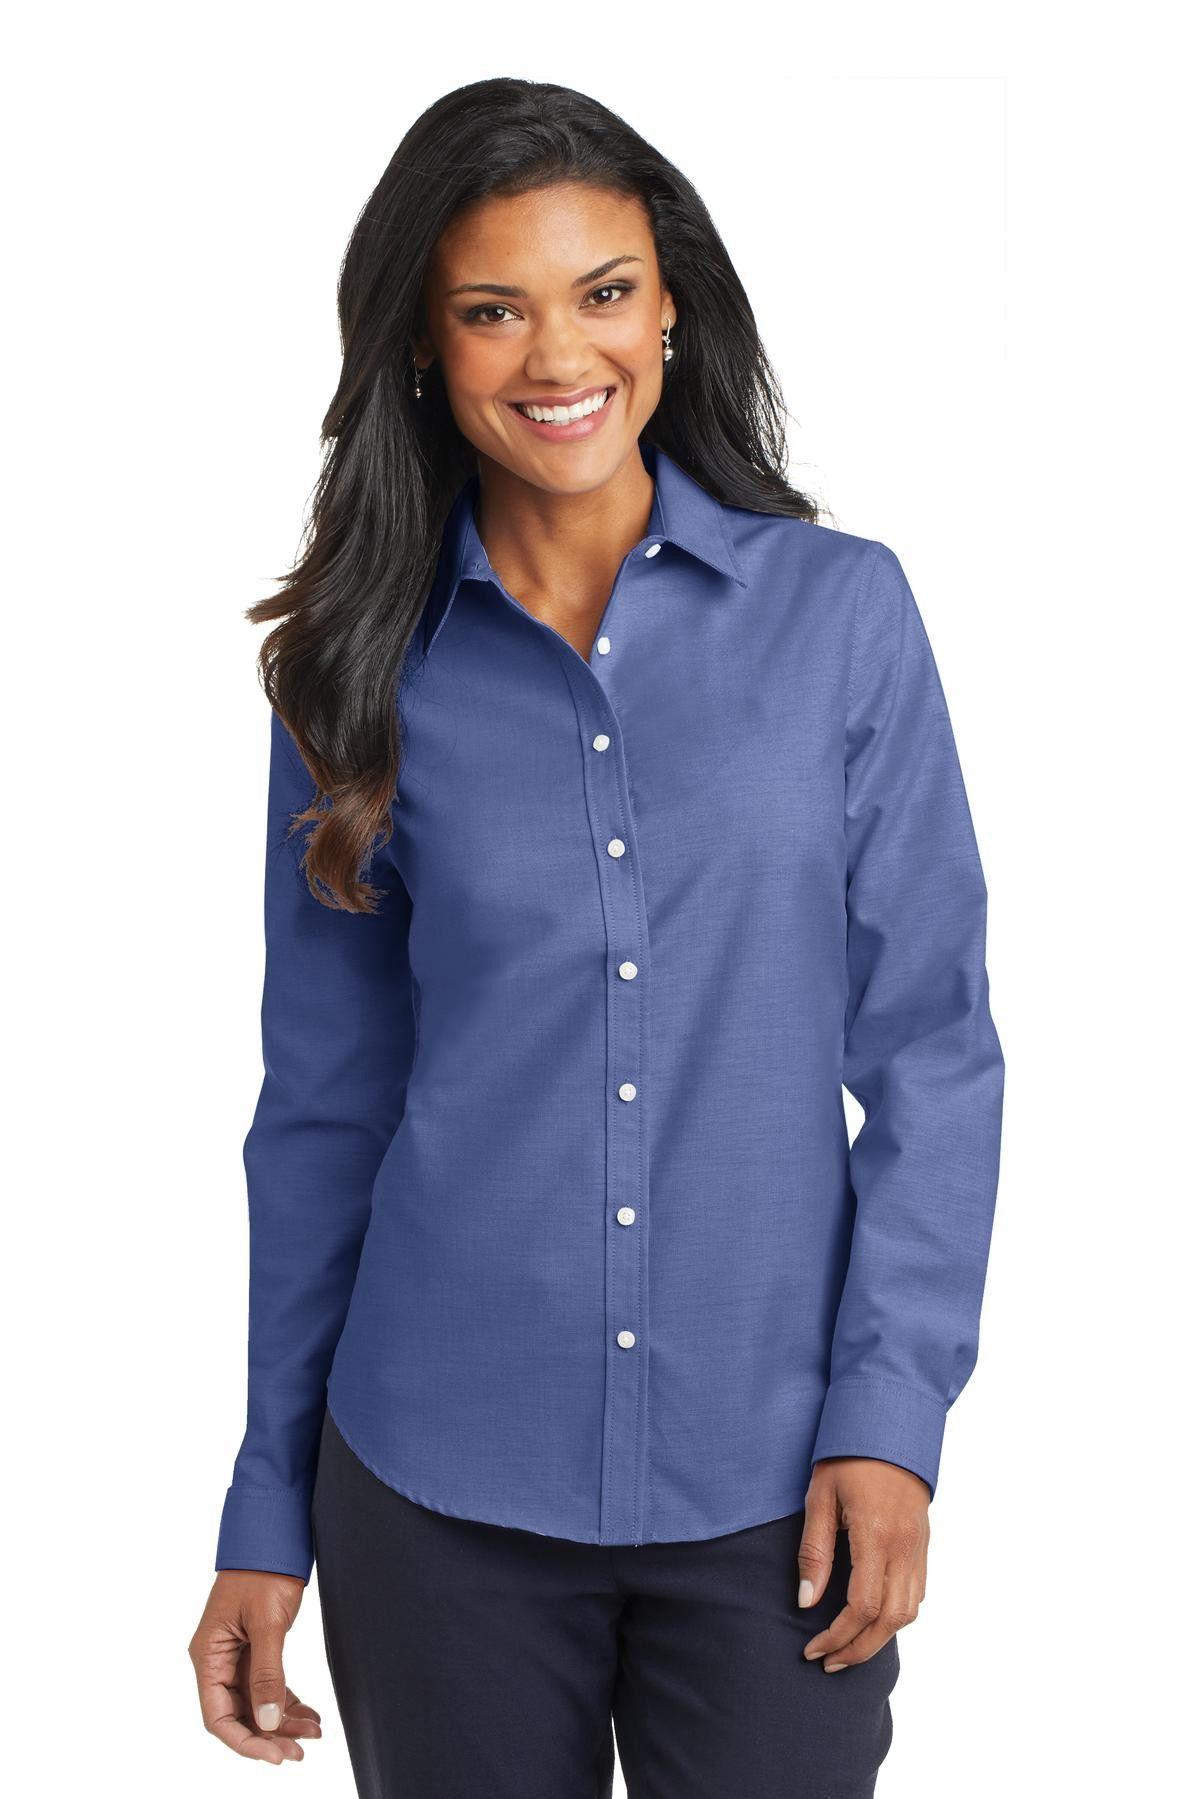 Port Authority Ladies SuperPro ™ Oxford Shirt. L658 Navy